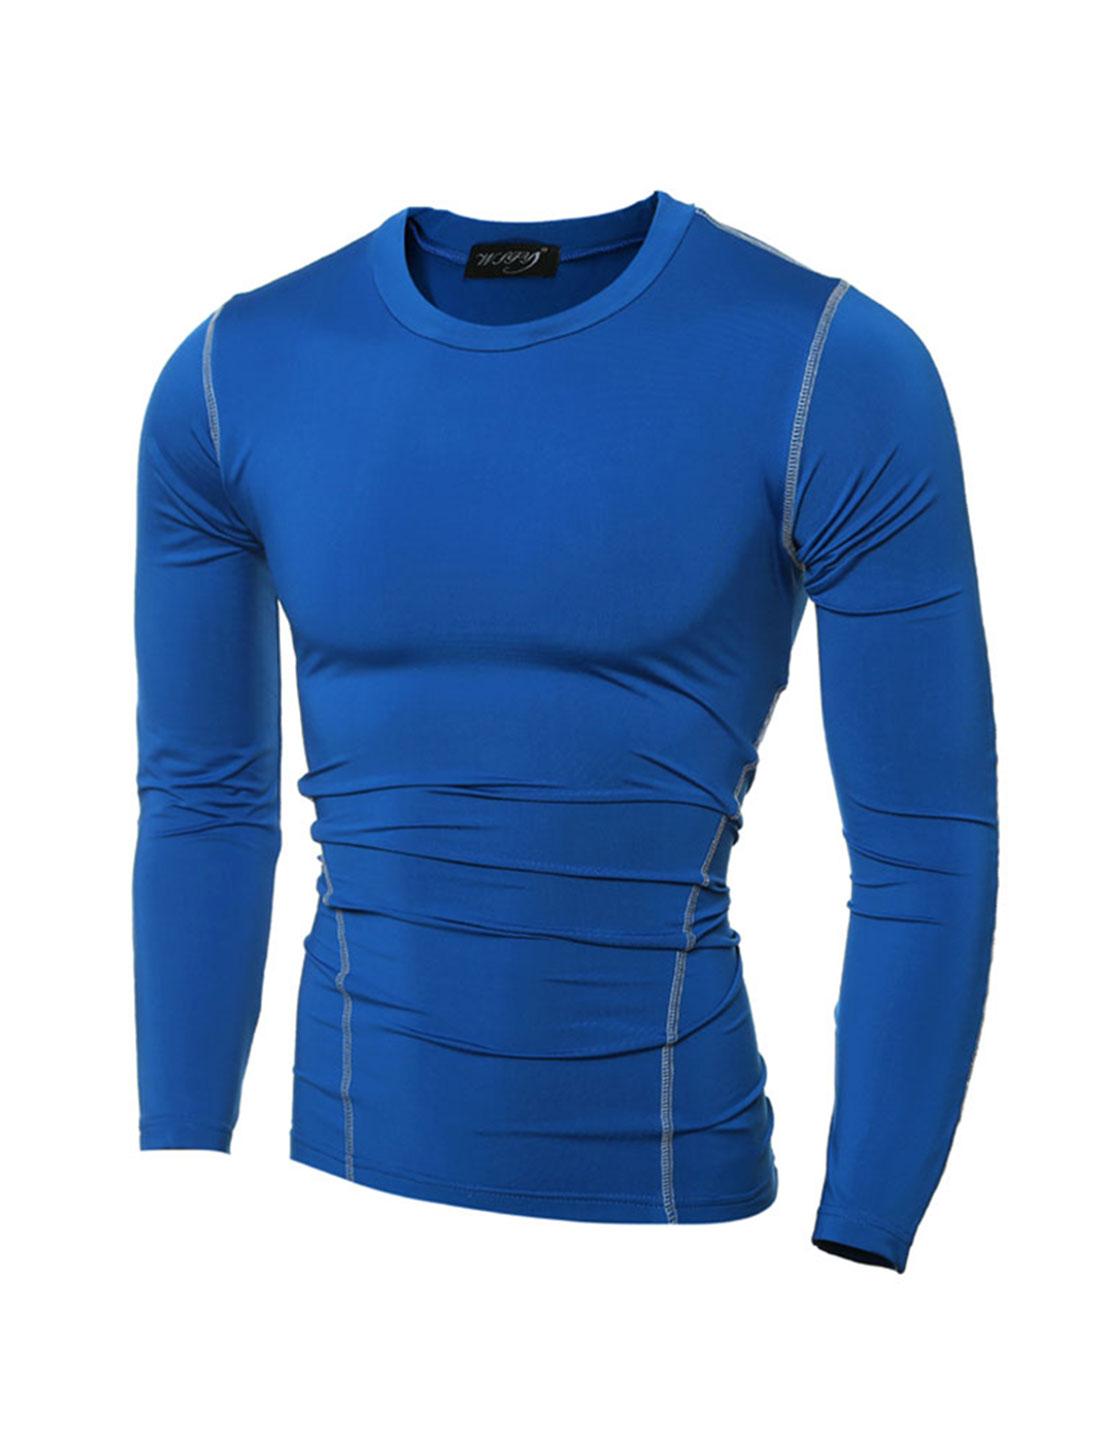 Men Crew Neck Long Sleeves Seam Decor Skin Tight T-Shirt Royal Blue S